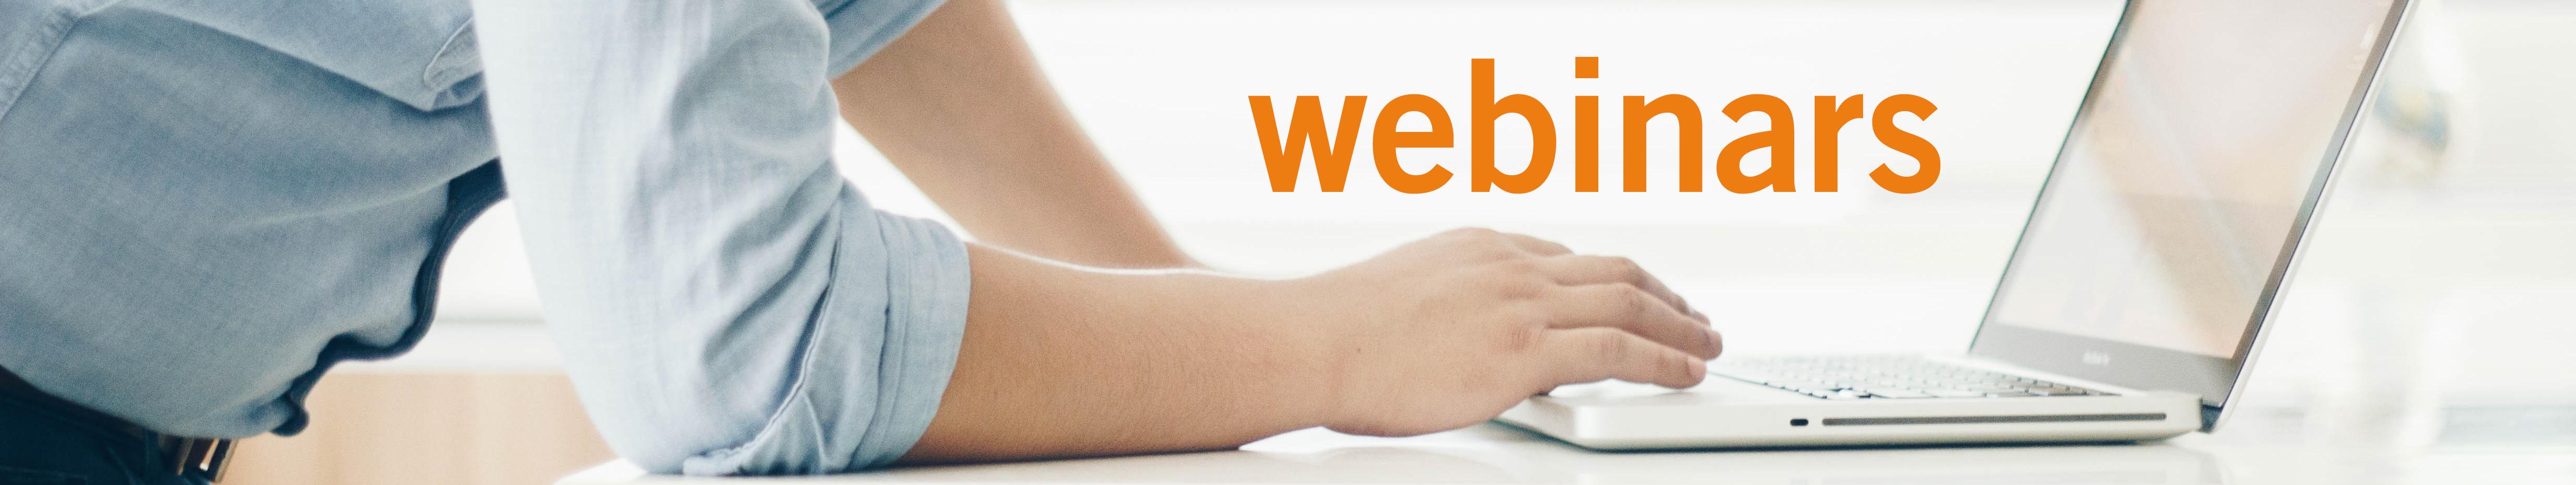 webinars from eurofins environment testing